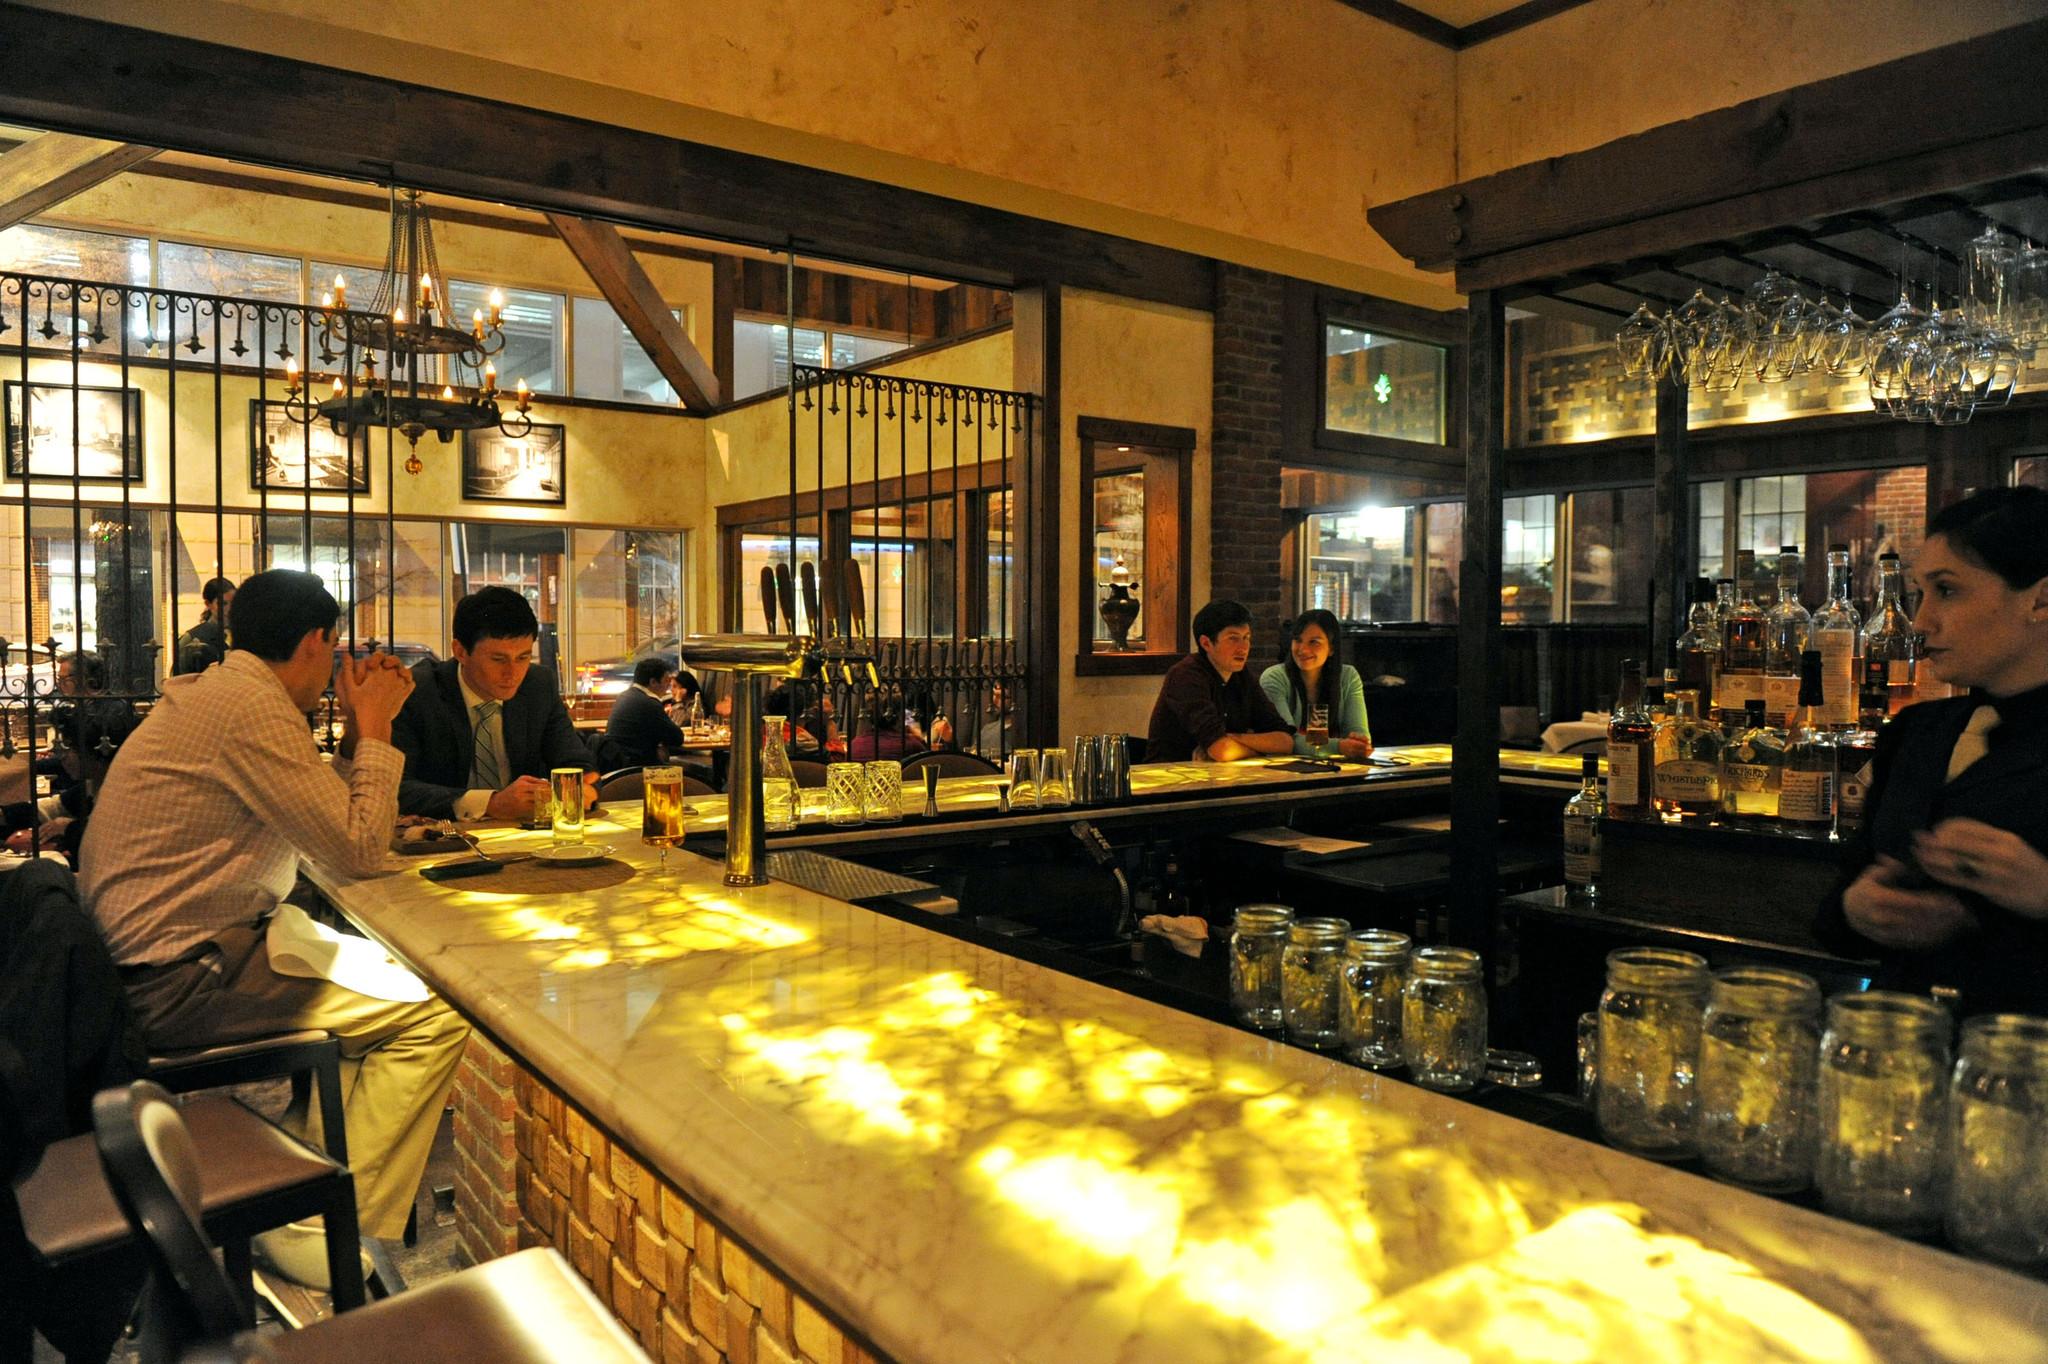 The bar at the Tavern Room.